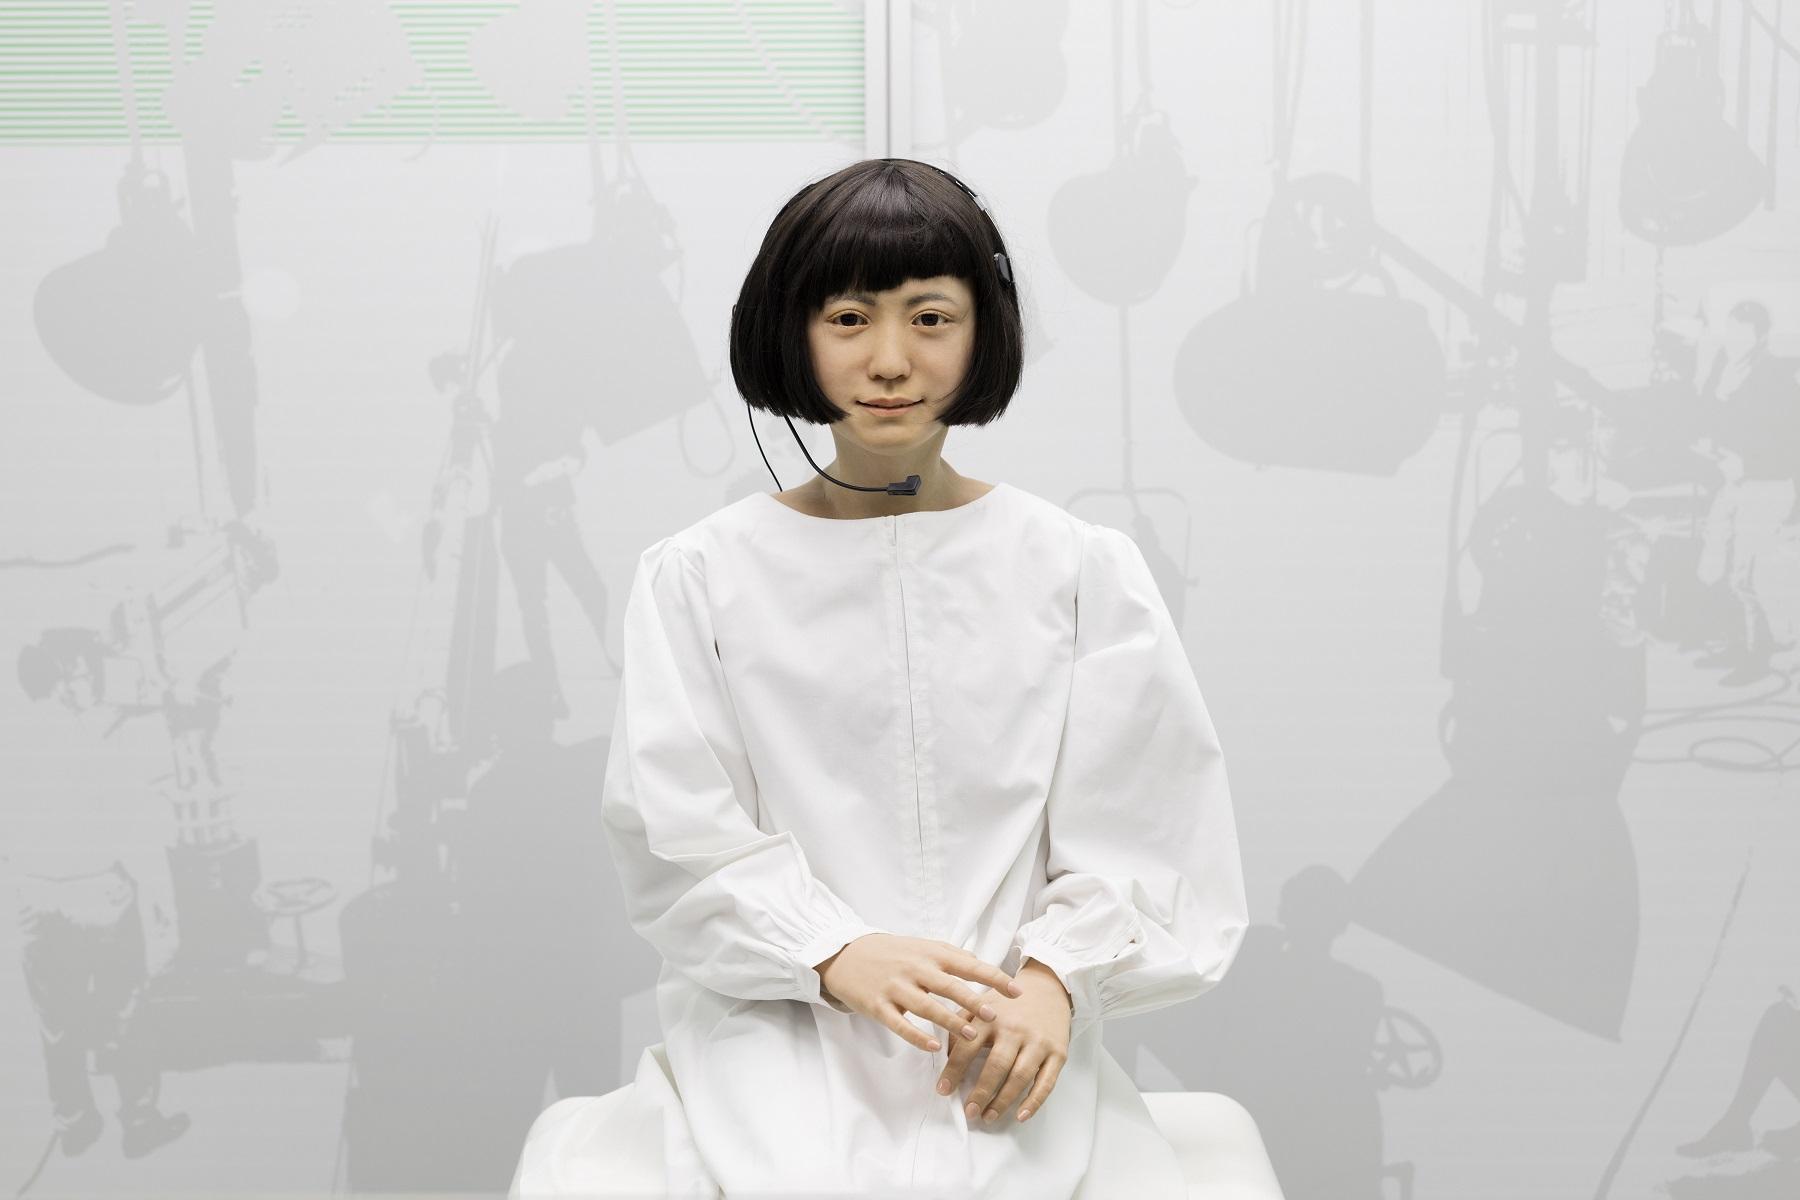 Kodomoroid, a Andróide japonesa que lê notícias. Foto Science Museum